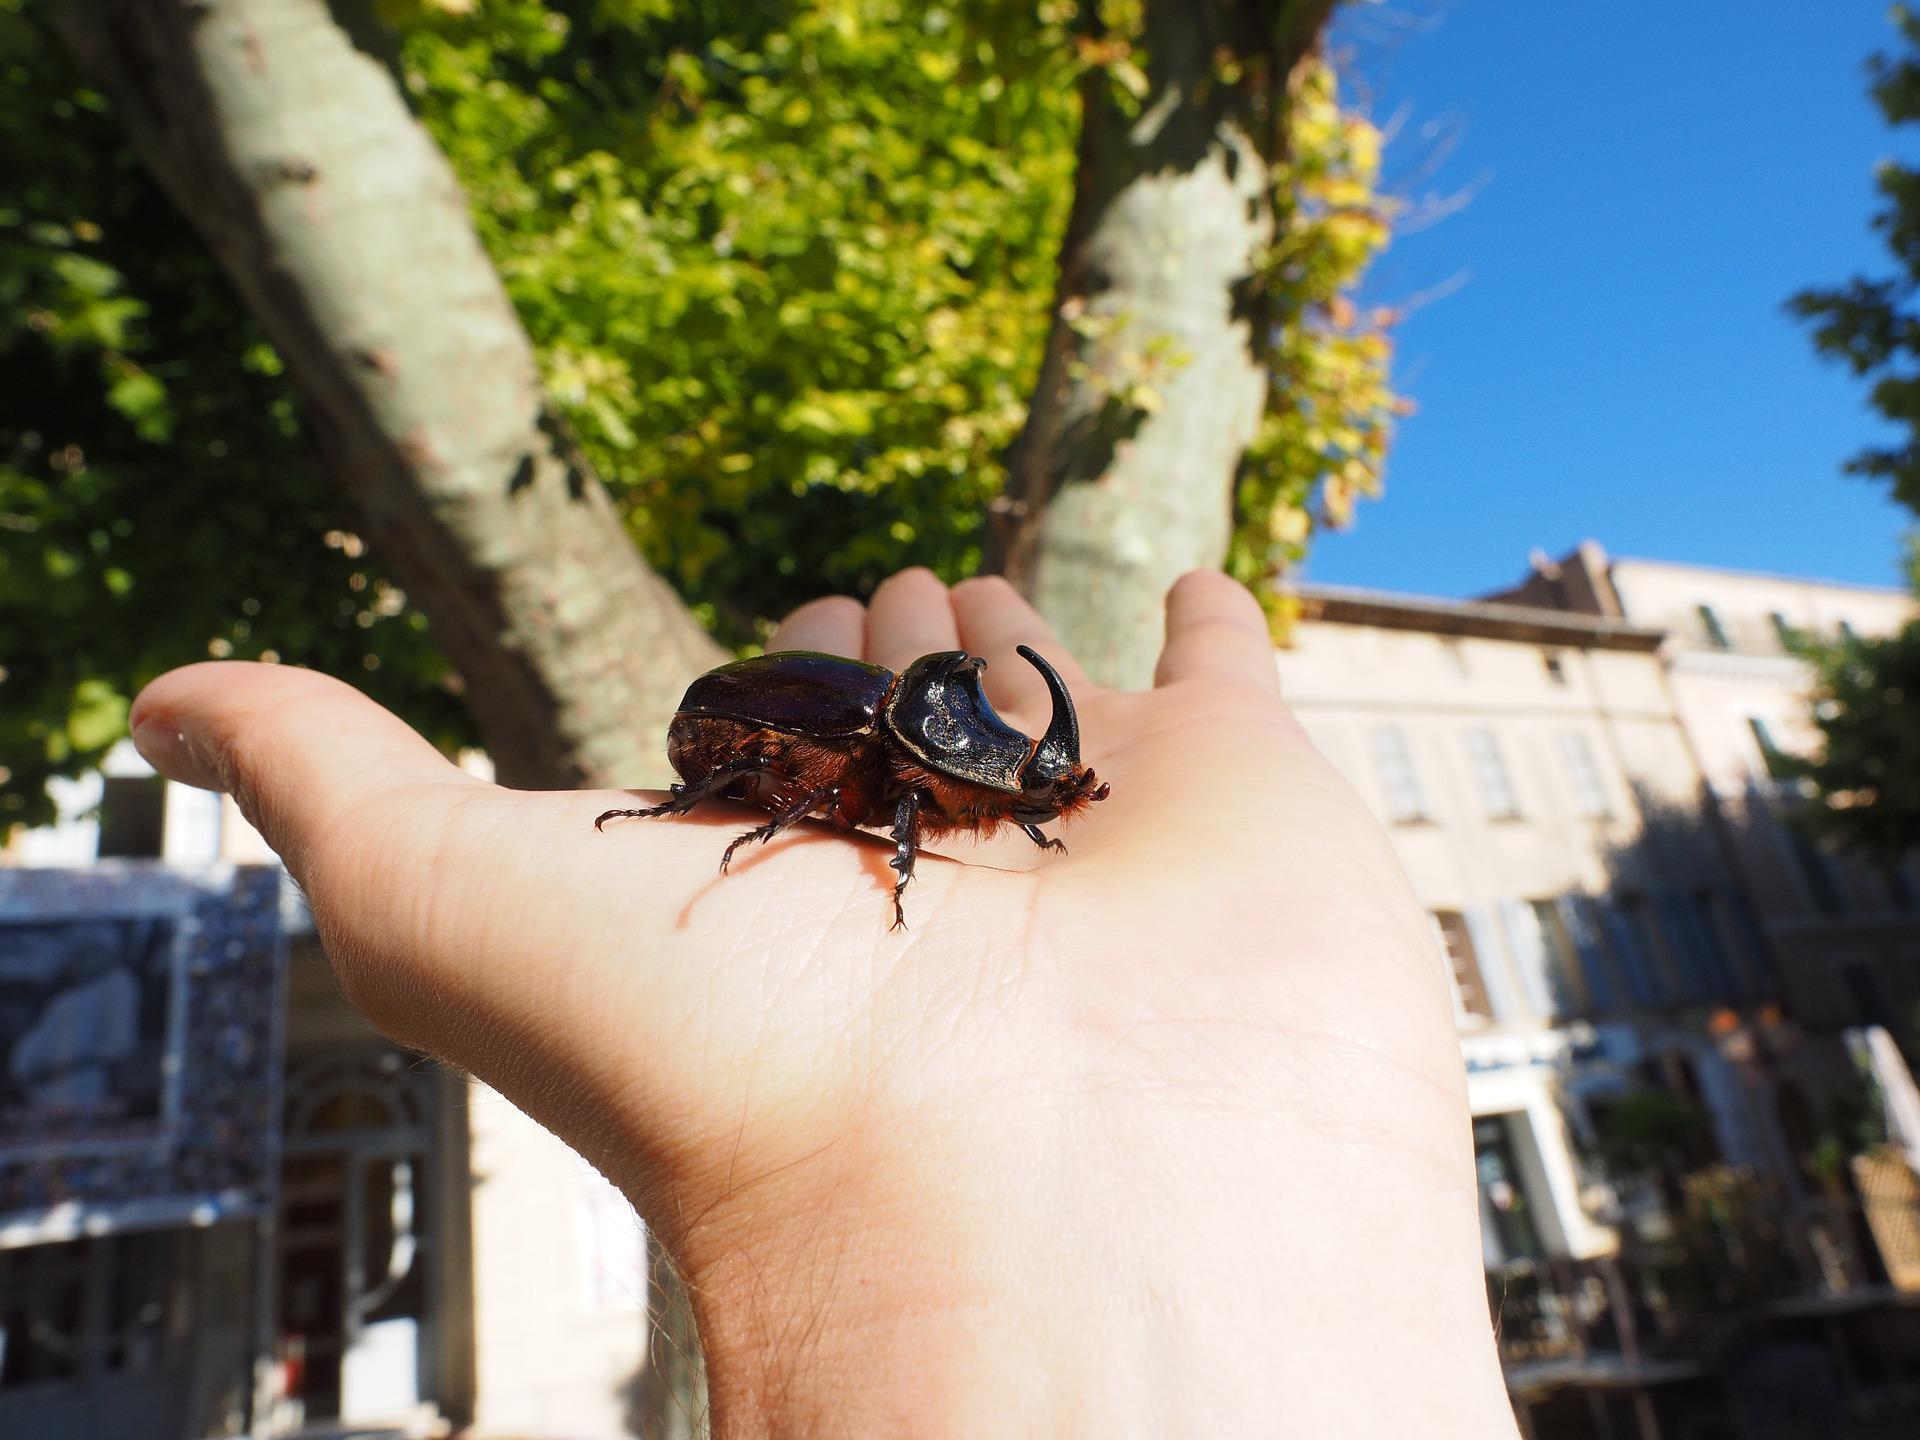 rhinoceros-beetle-1521626_1920